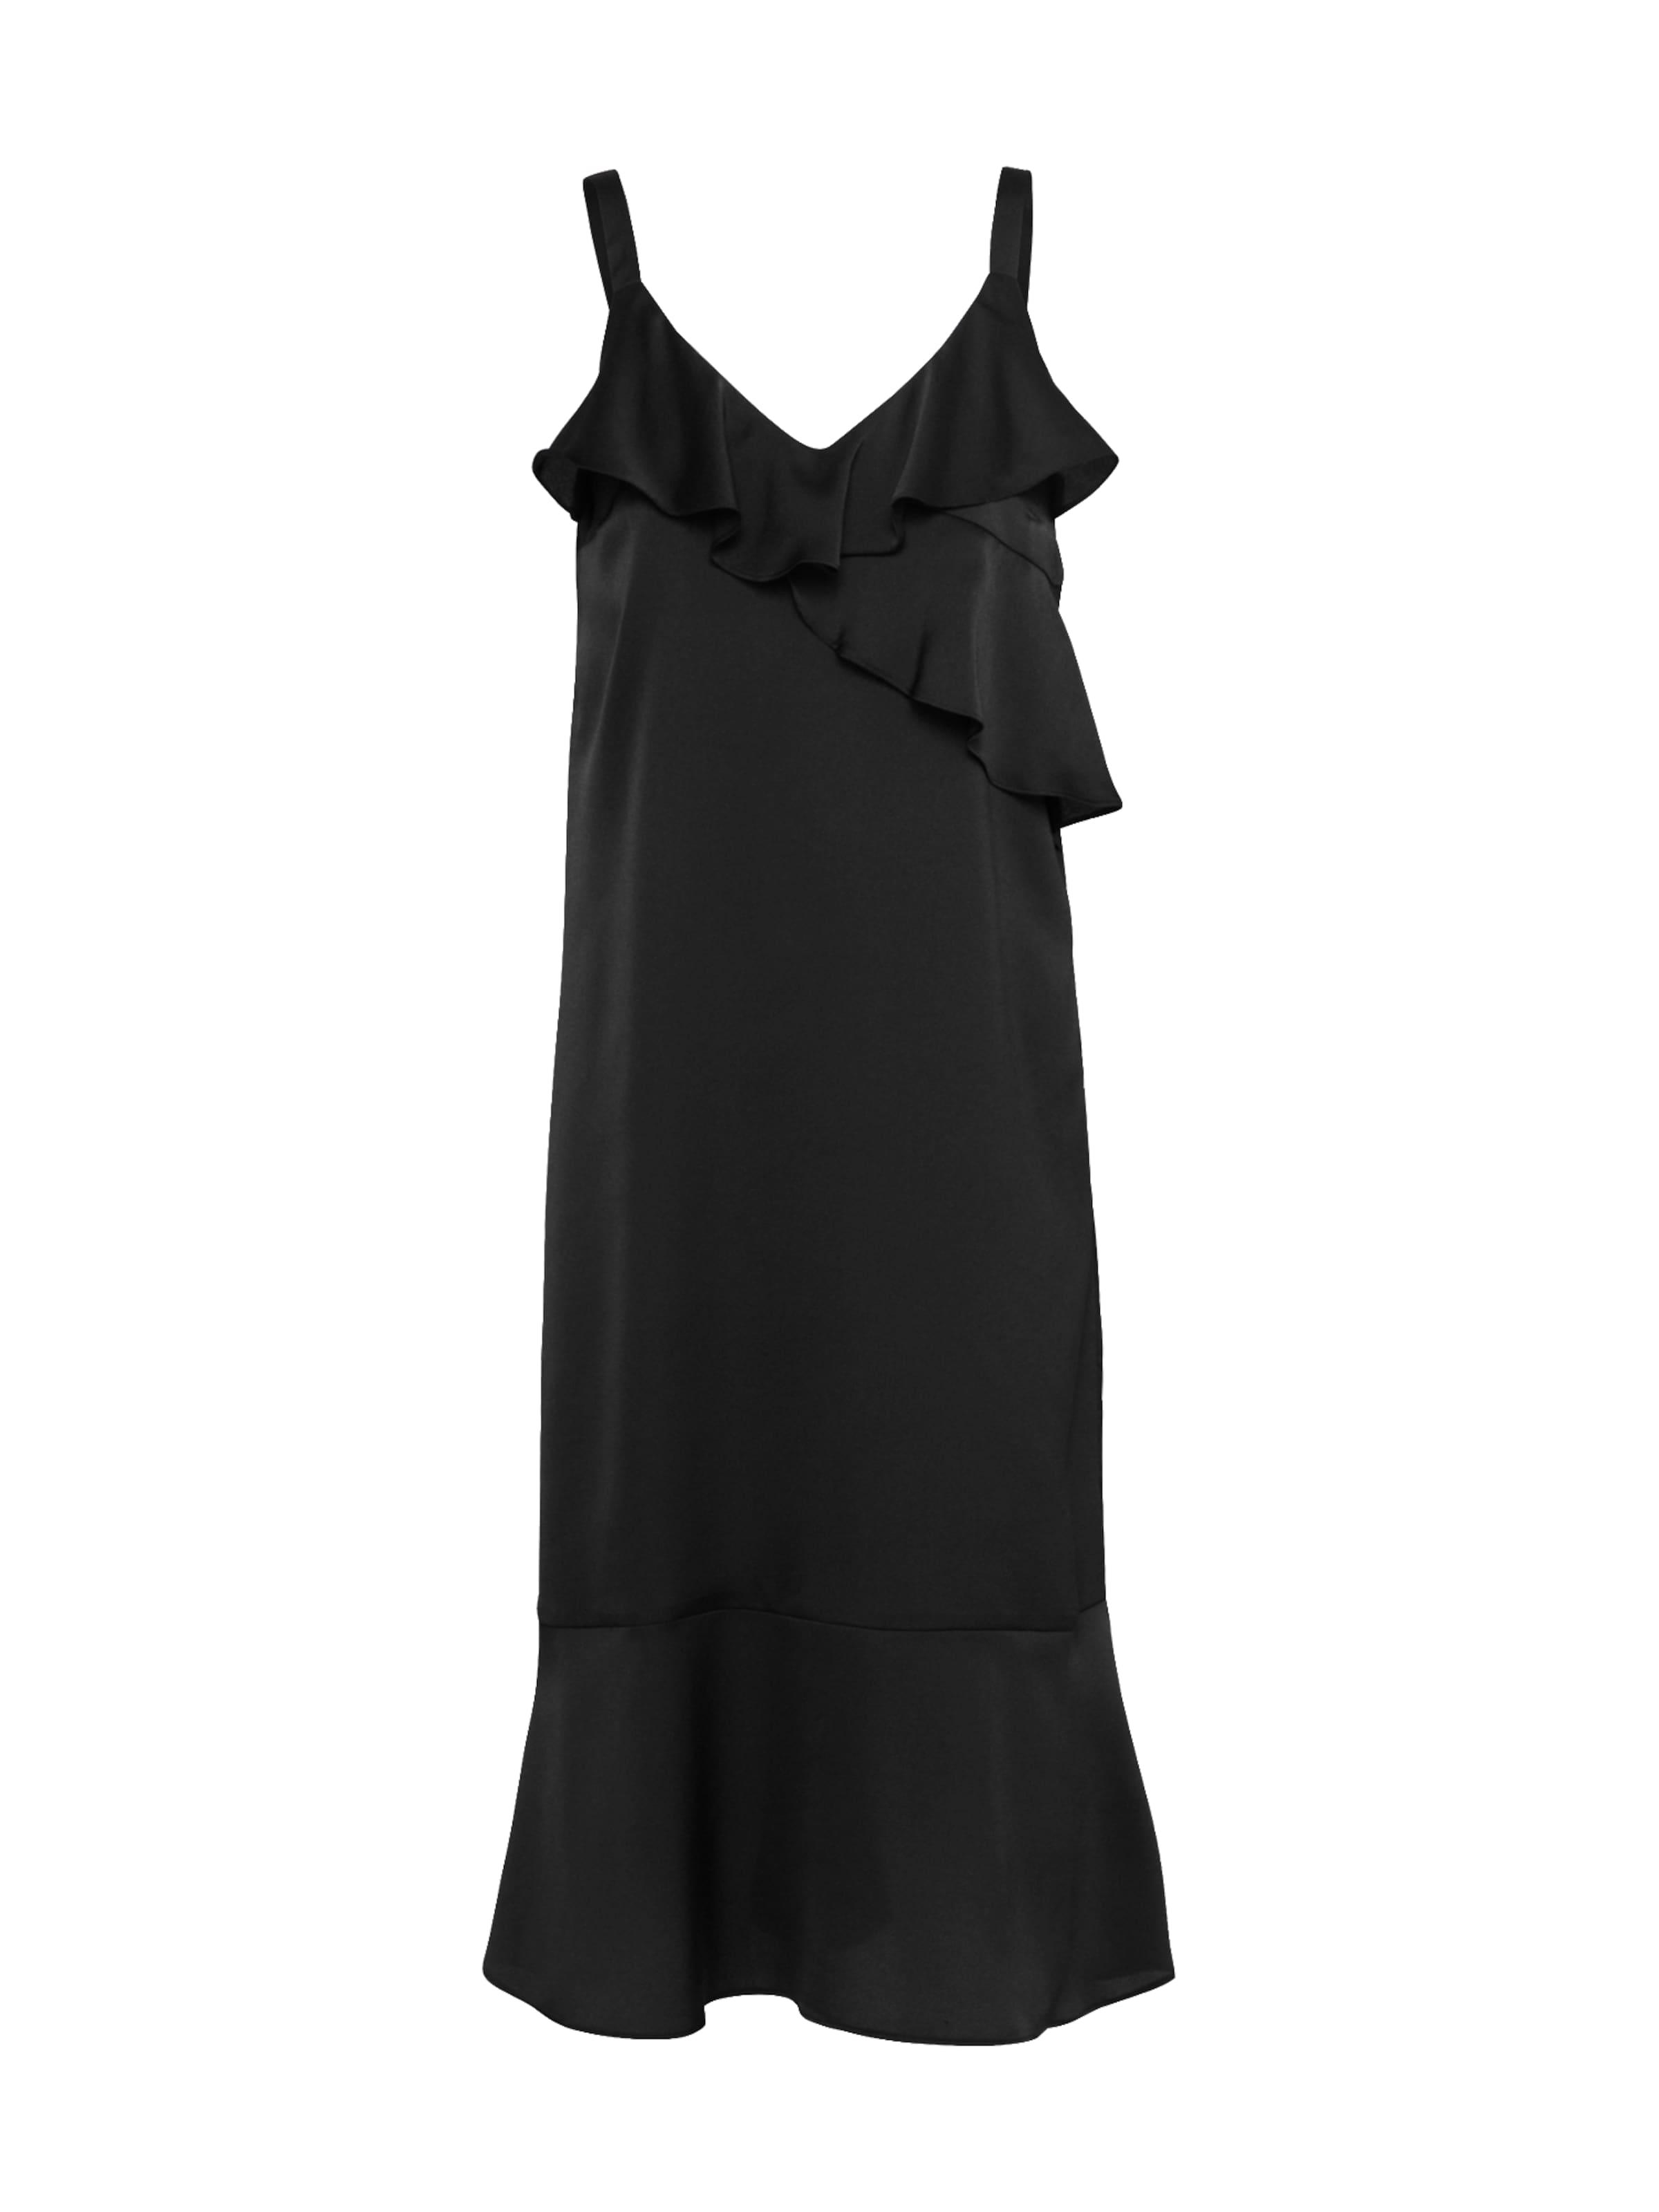 D'été 'leia' En Robe Noir Edited 5jR4LA